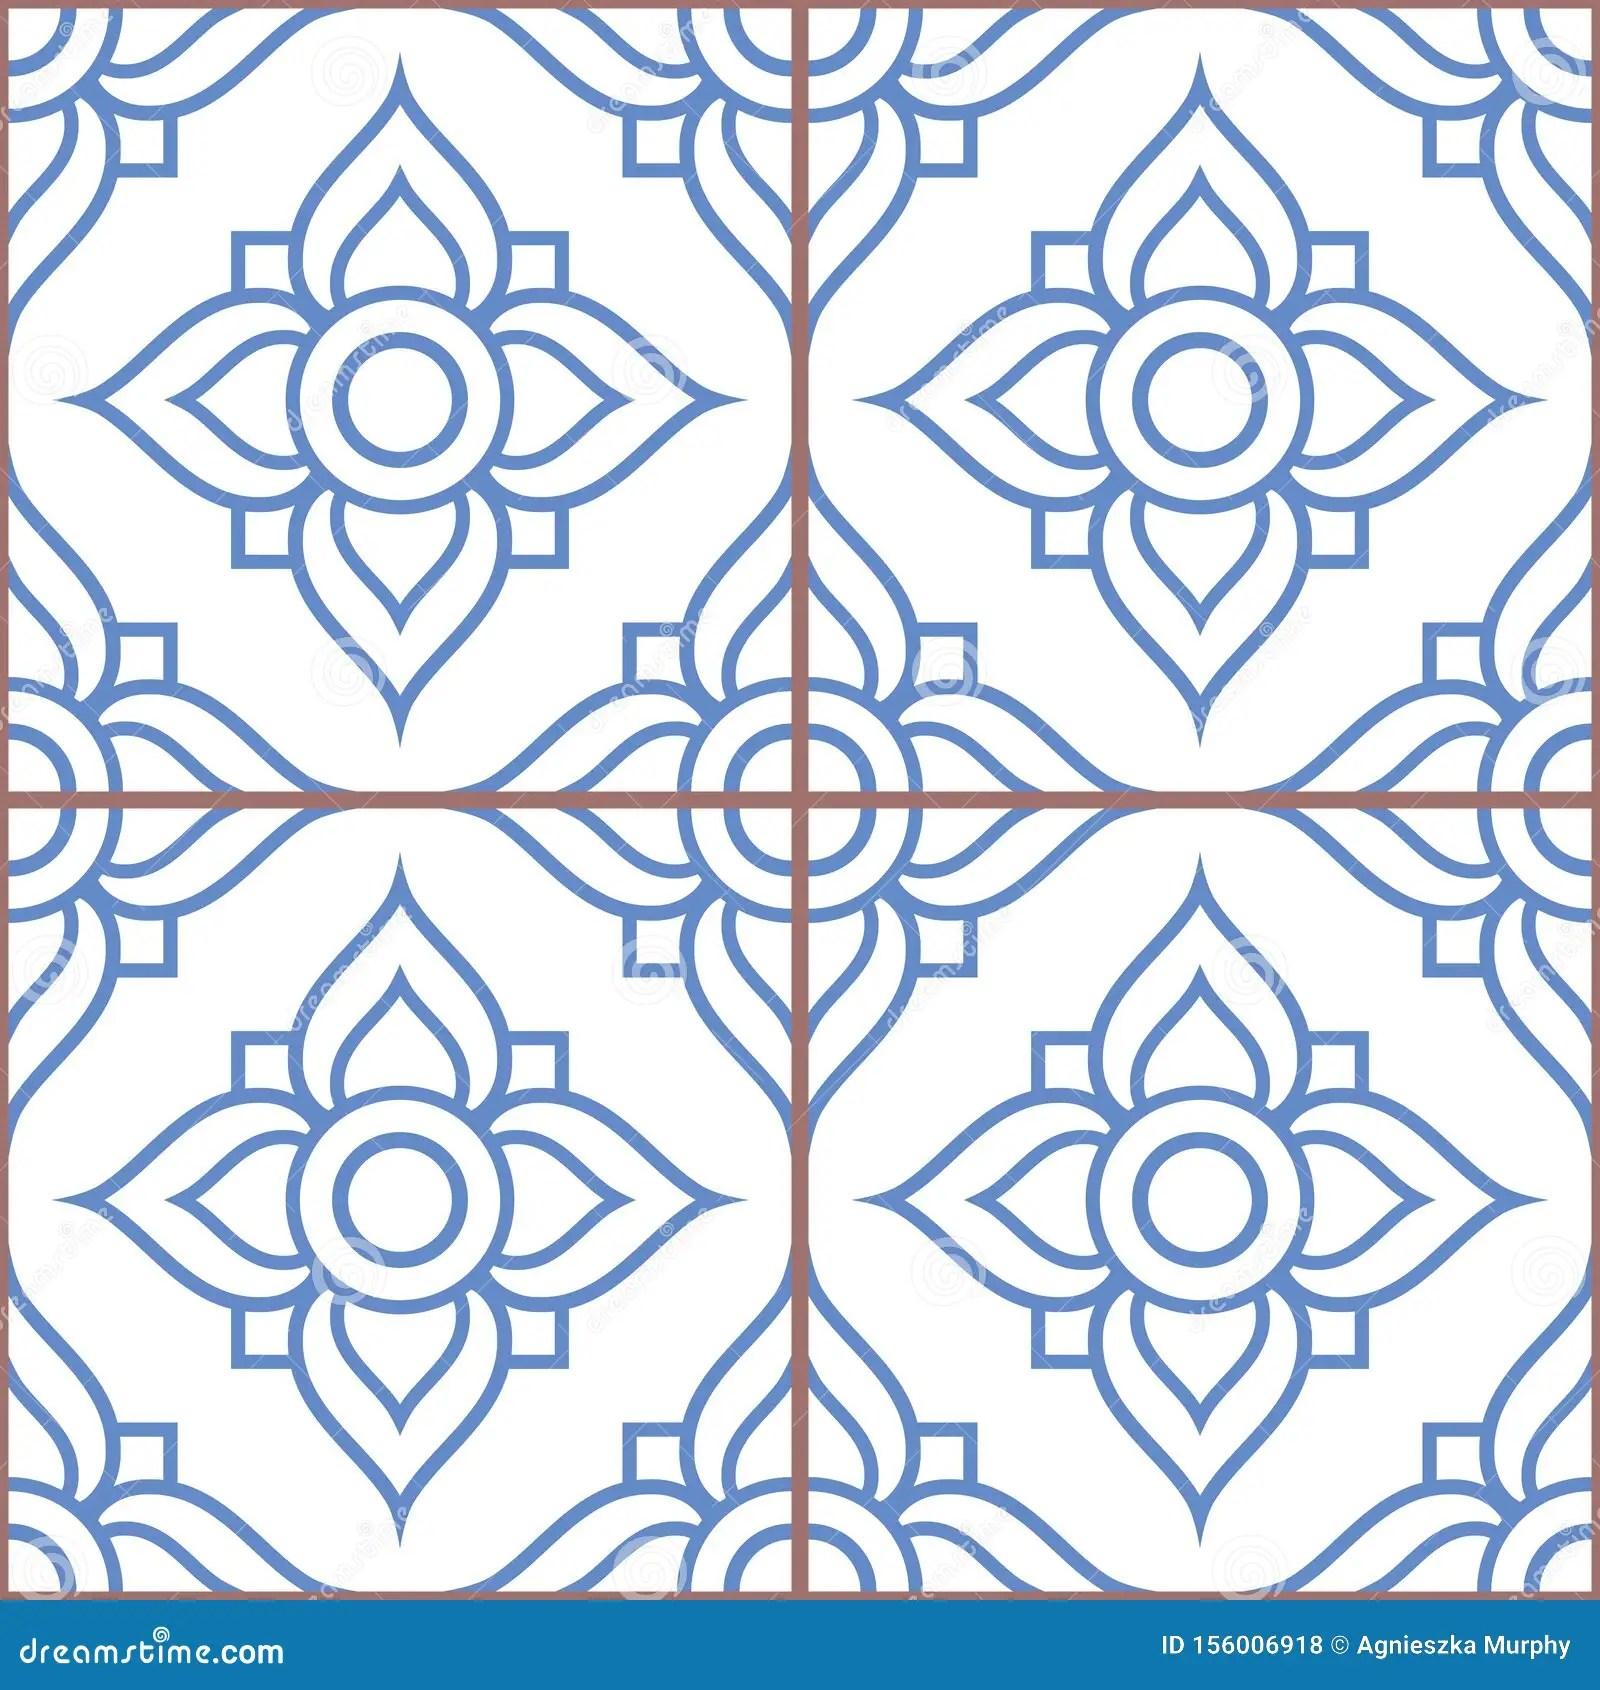 https www dreamstime com lisbon tiles azujelo moroccan vector seamless white navy blue design portuguese retro pattern decorative tile backgr image156006918